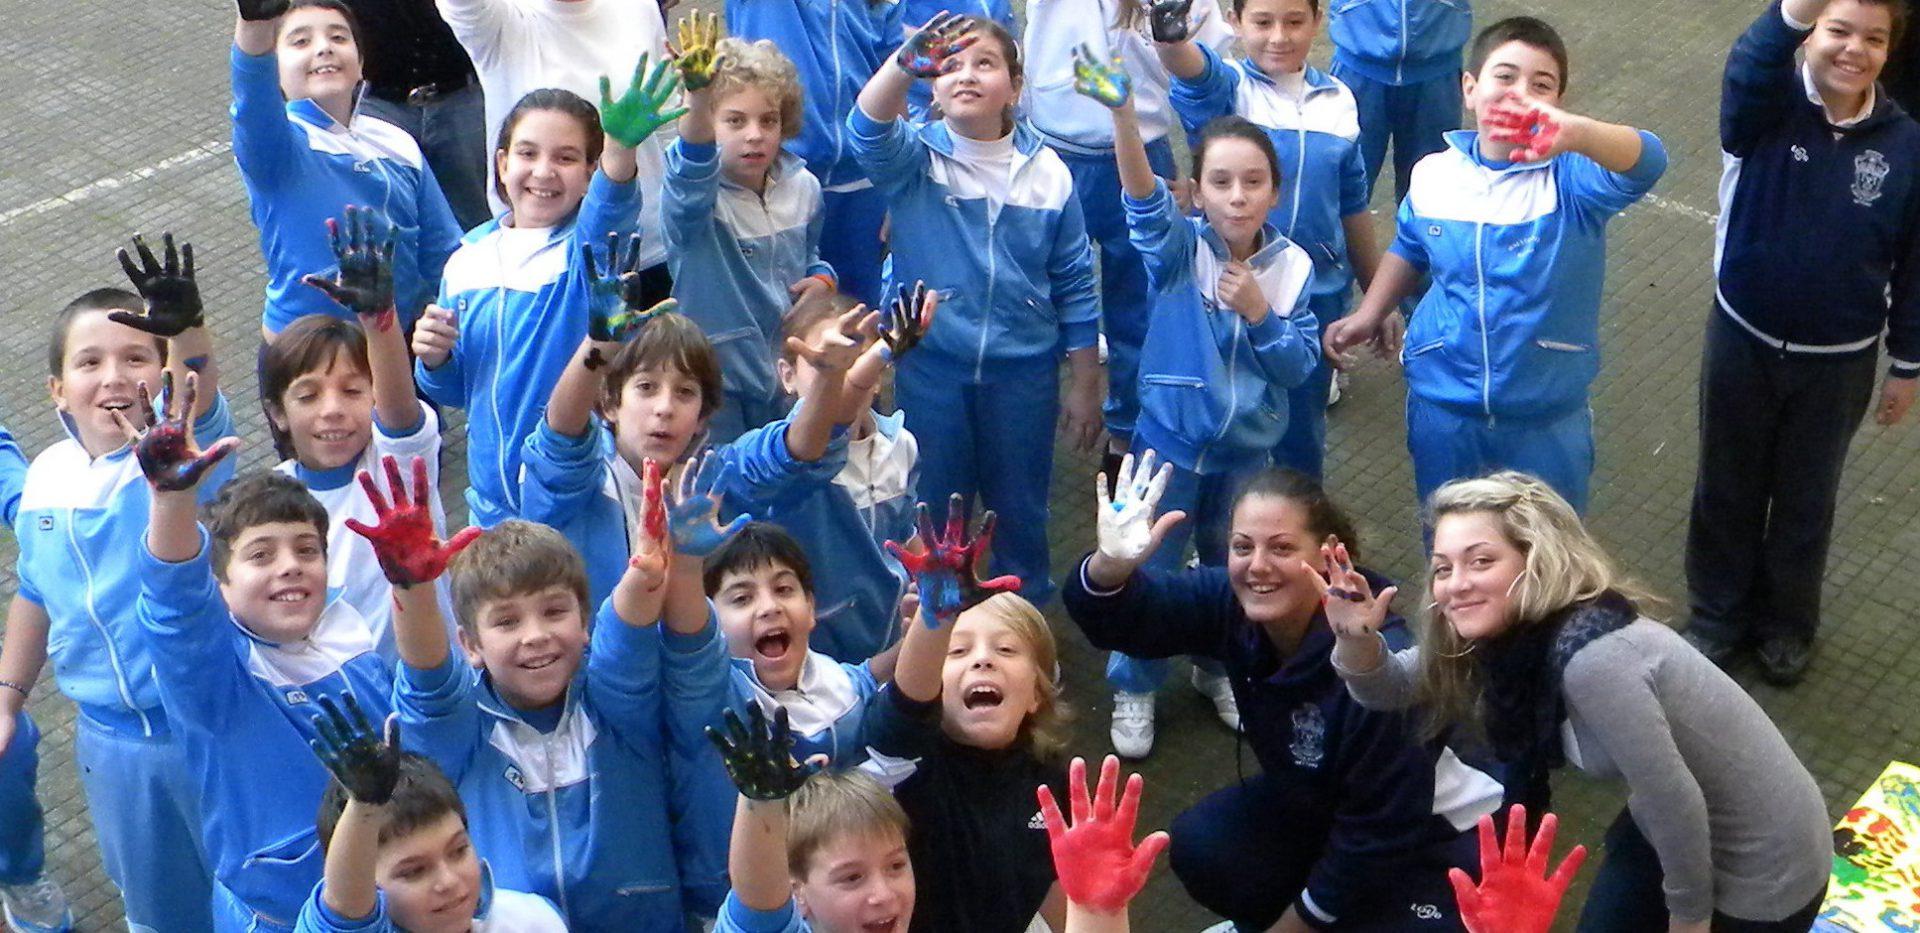 Giornata-Pedagogica-21-e1453319713520